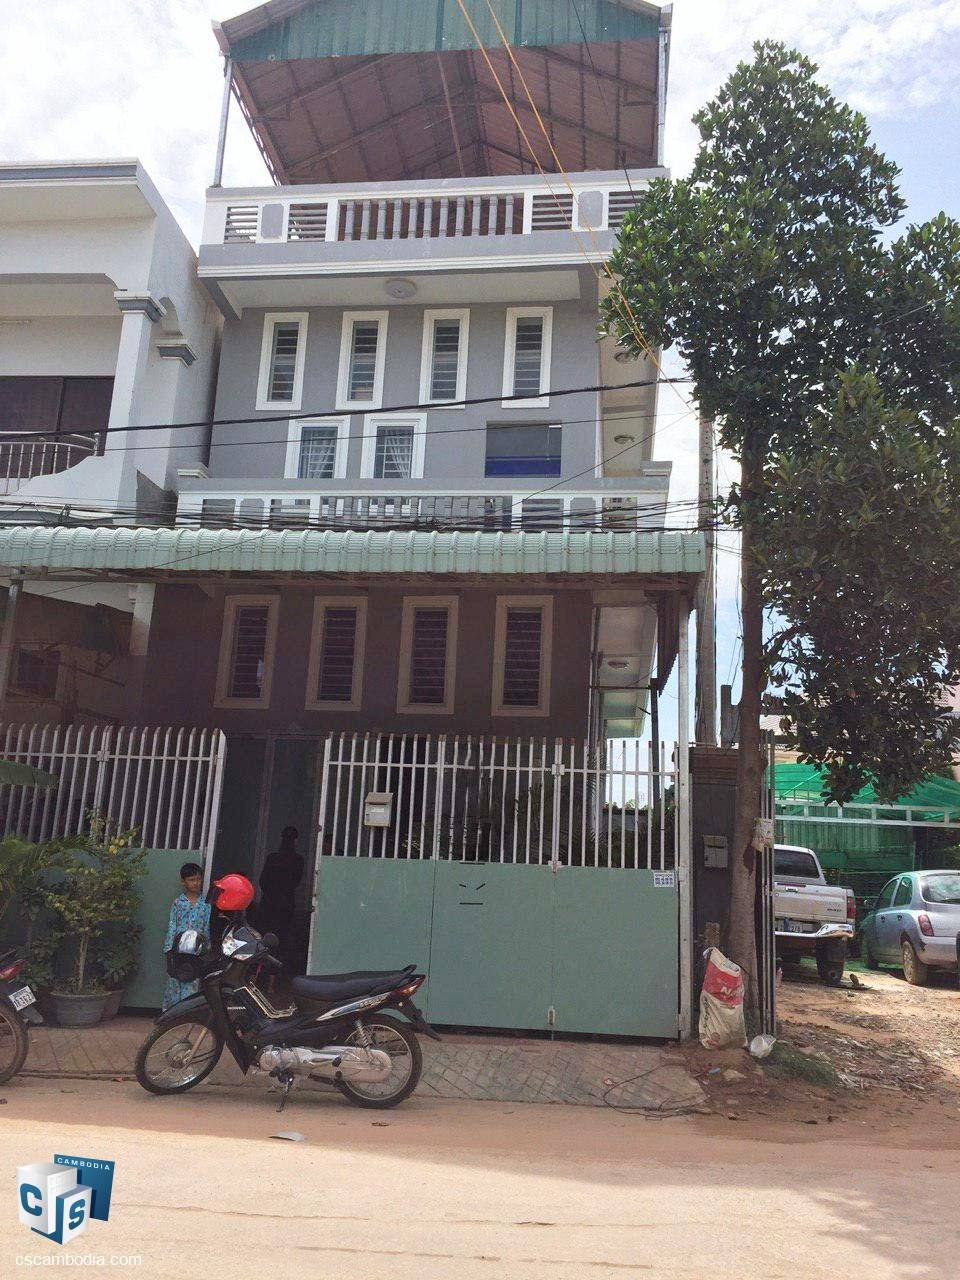 3 Bedroom House – For Sale – Taphul – Svay Dangkum – Siem Reap